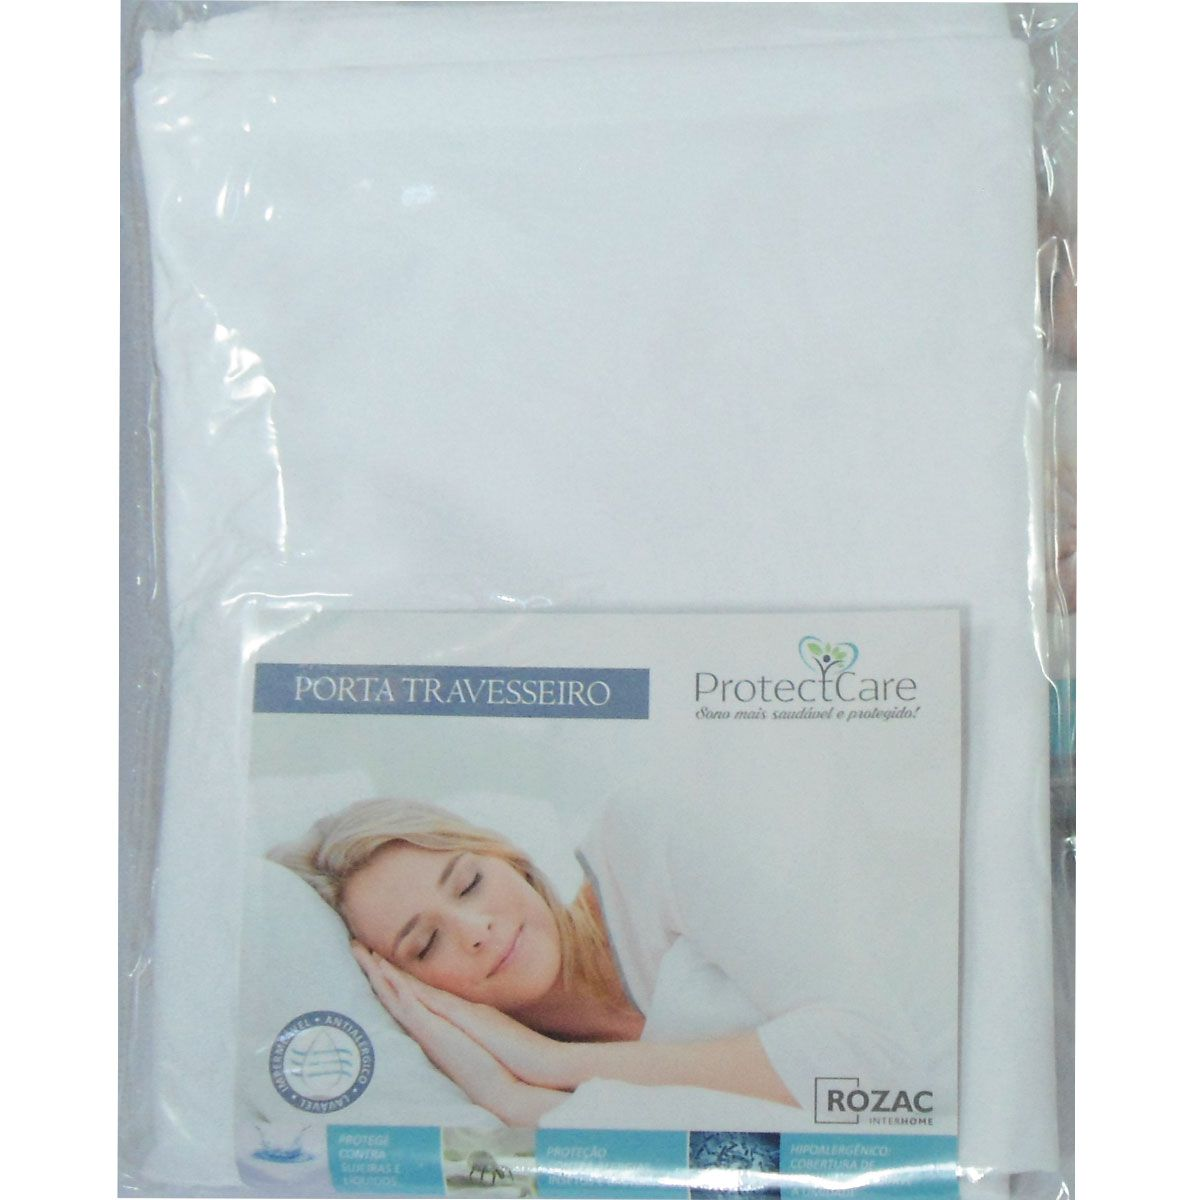 Kit 2 Fronhas Impermeável Tecido Malha - Porta Travesseiro - Protect Care Rozac Antialérgico